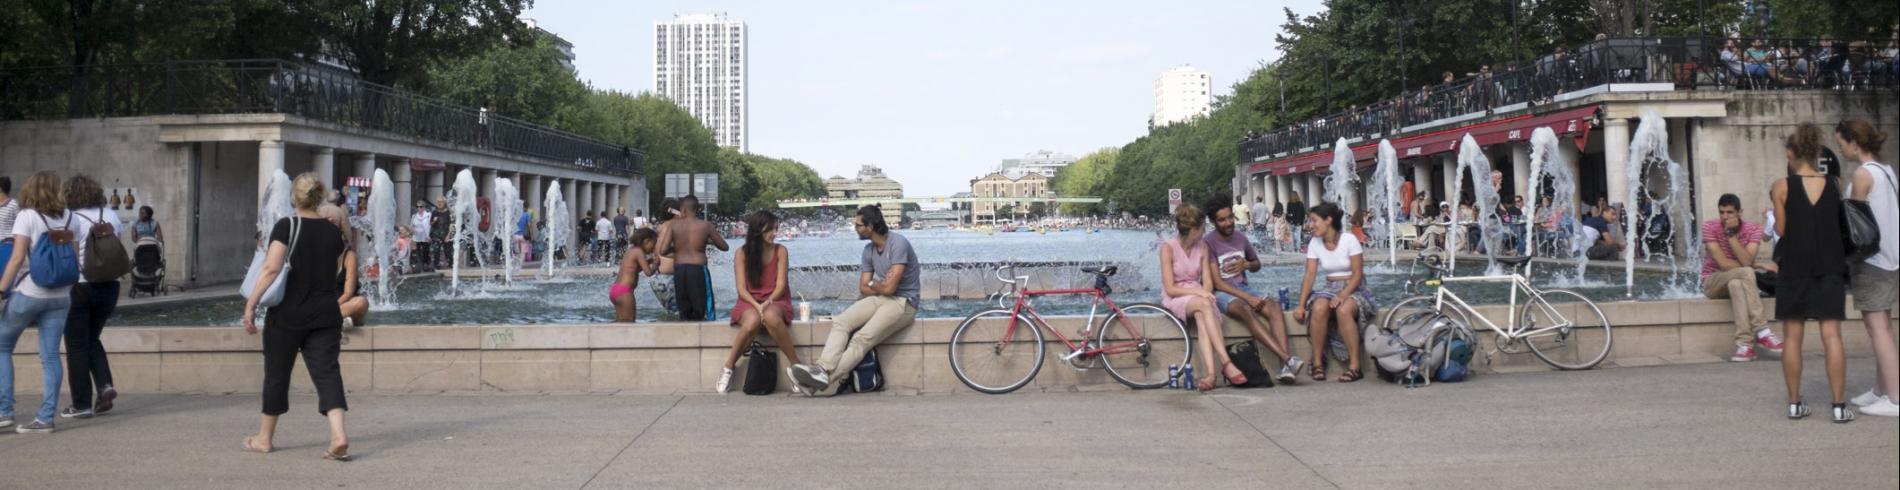 People sitting around a water feature in Parc de la Villette